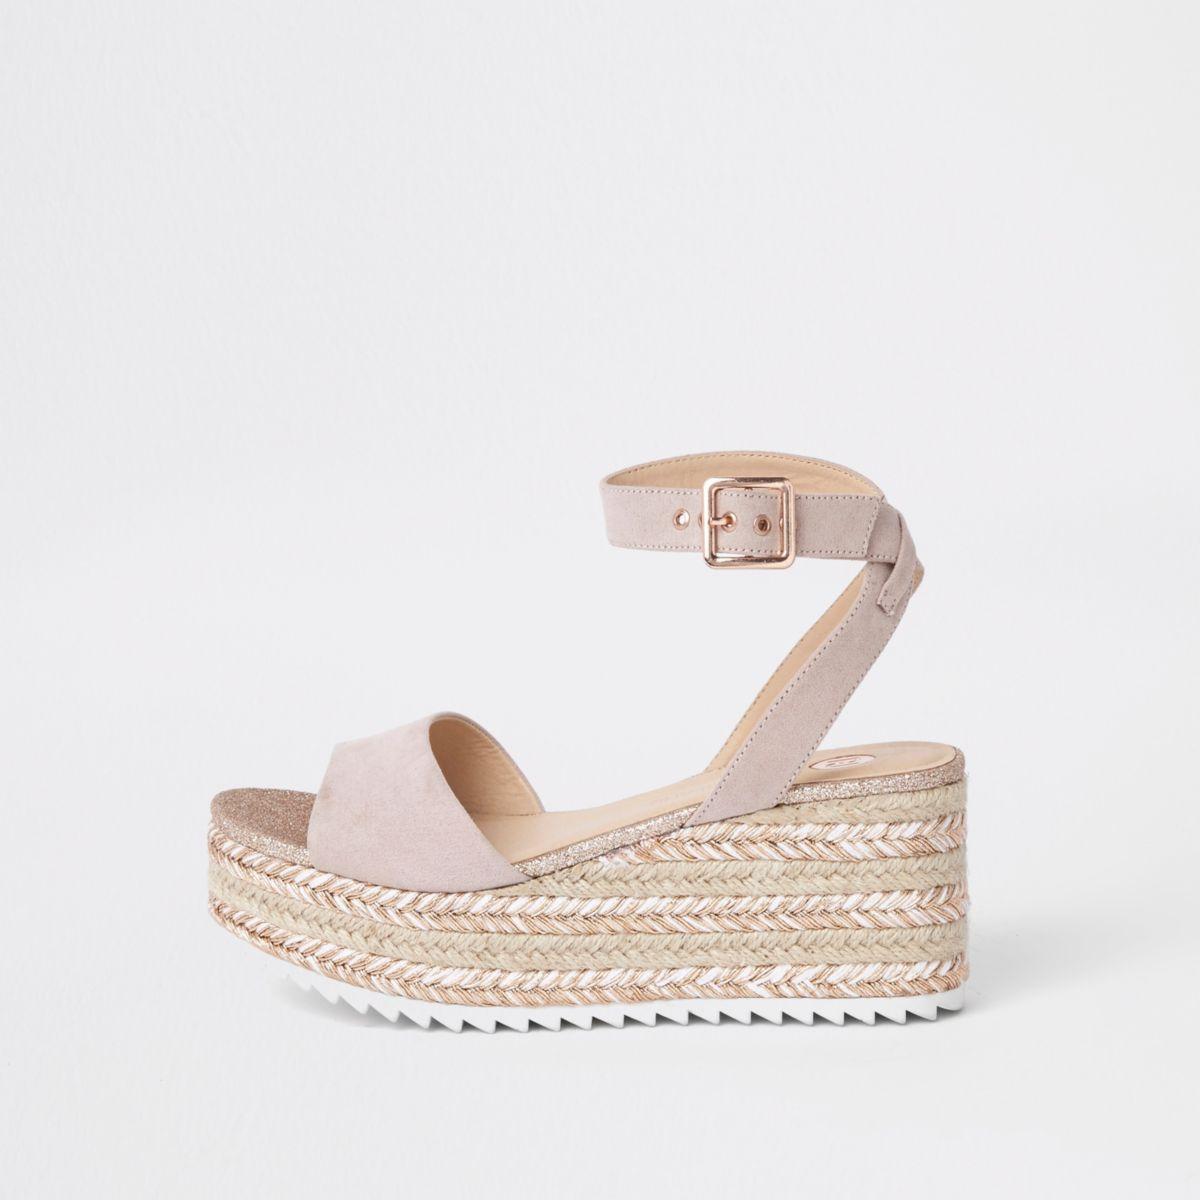 Gold Glitter Espadrille Platform Sandals by River Island